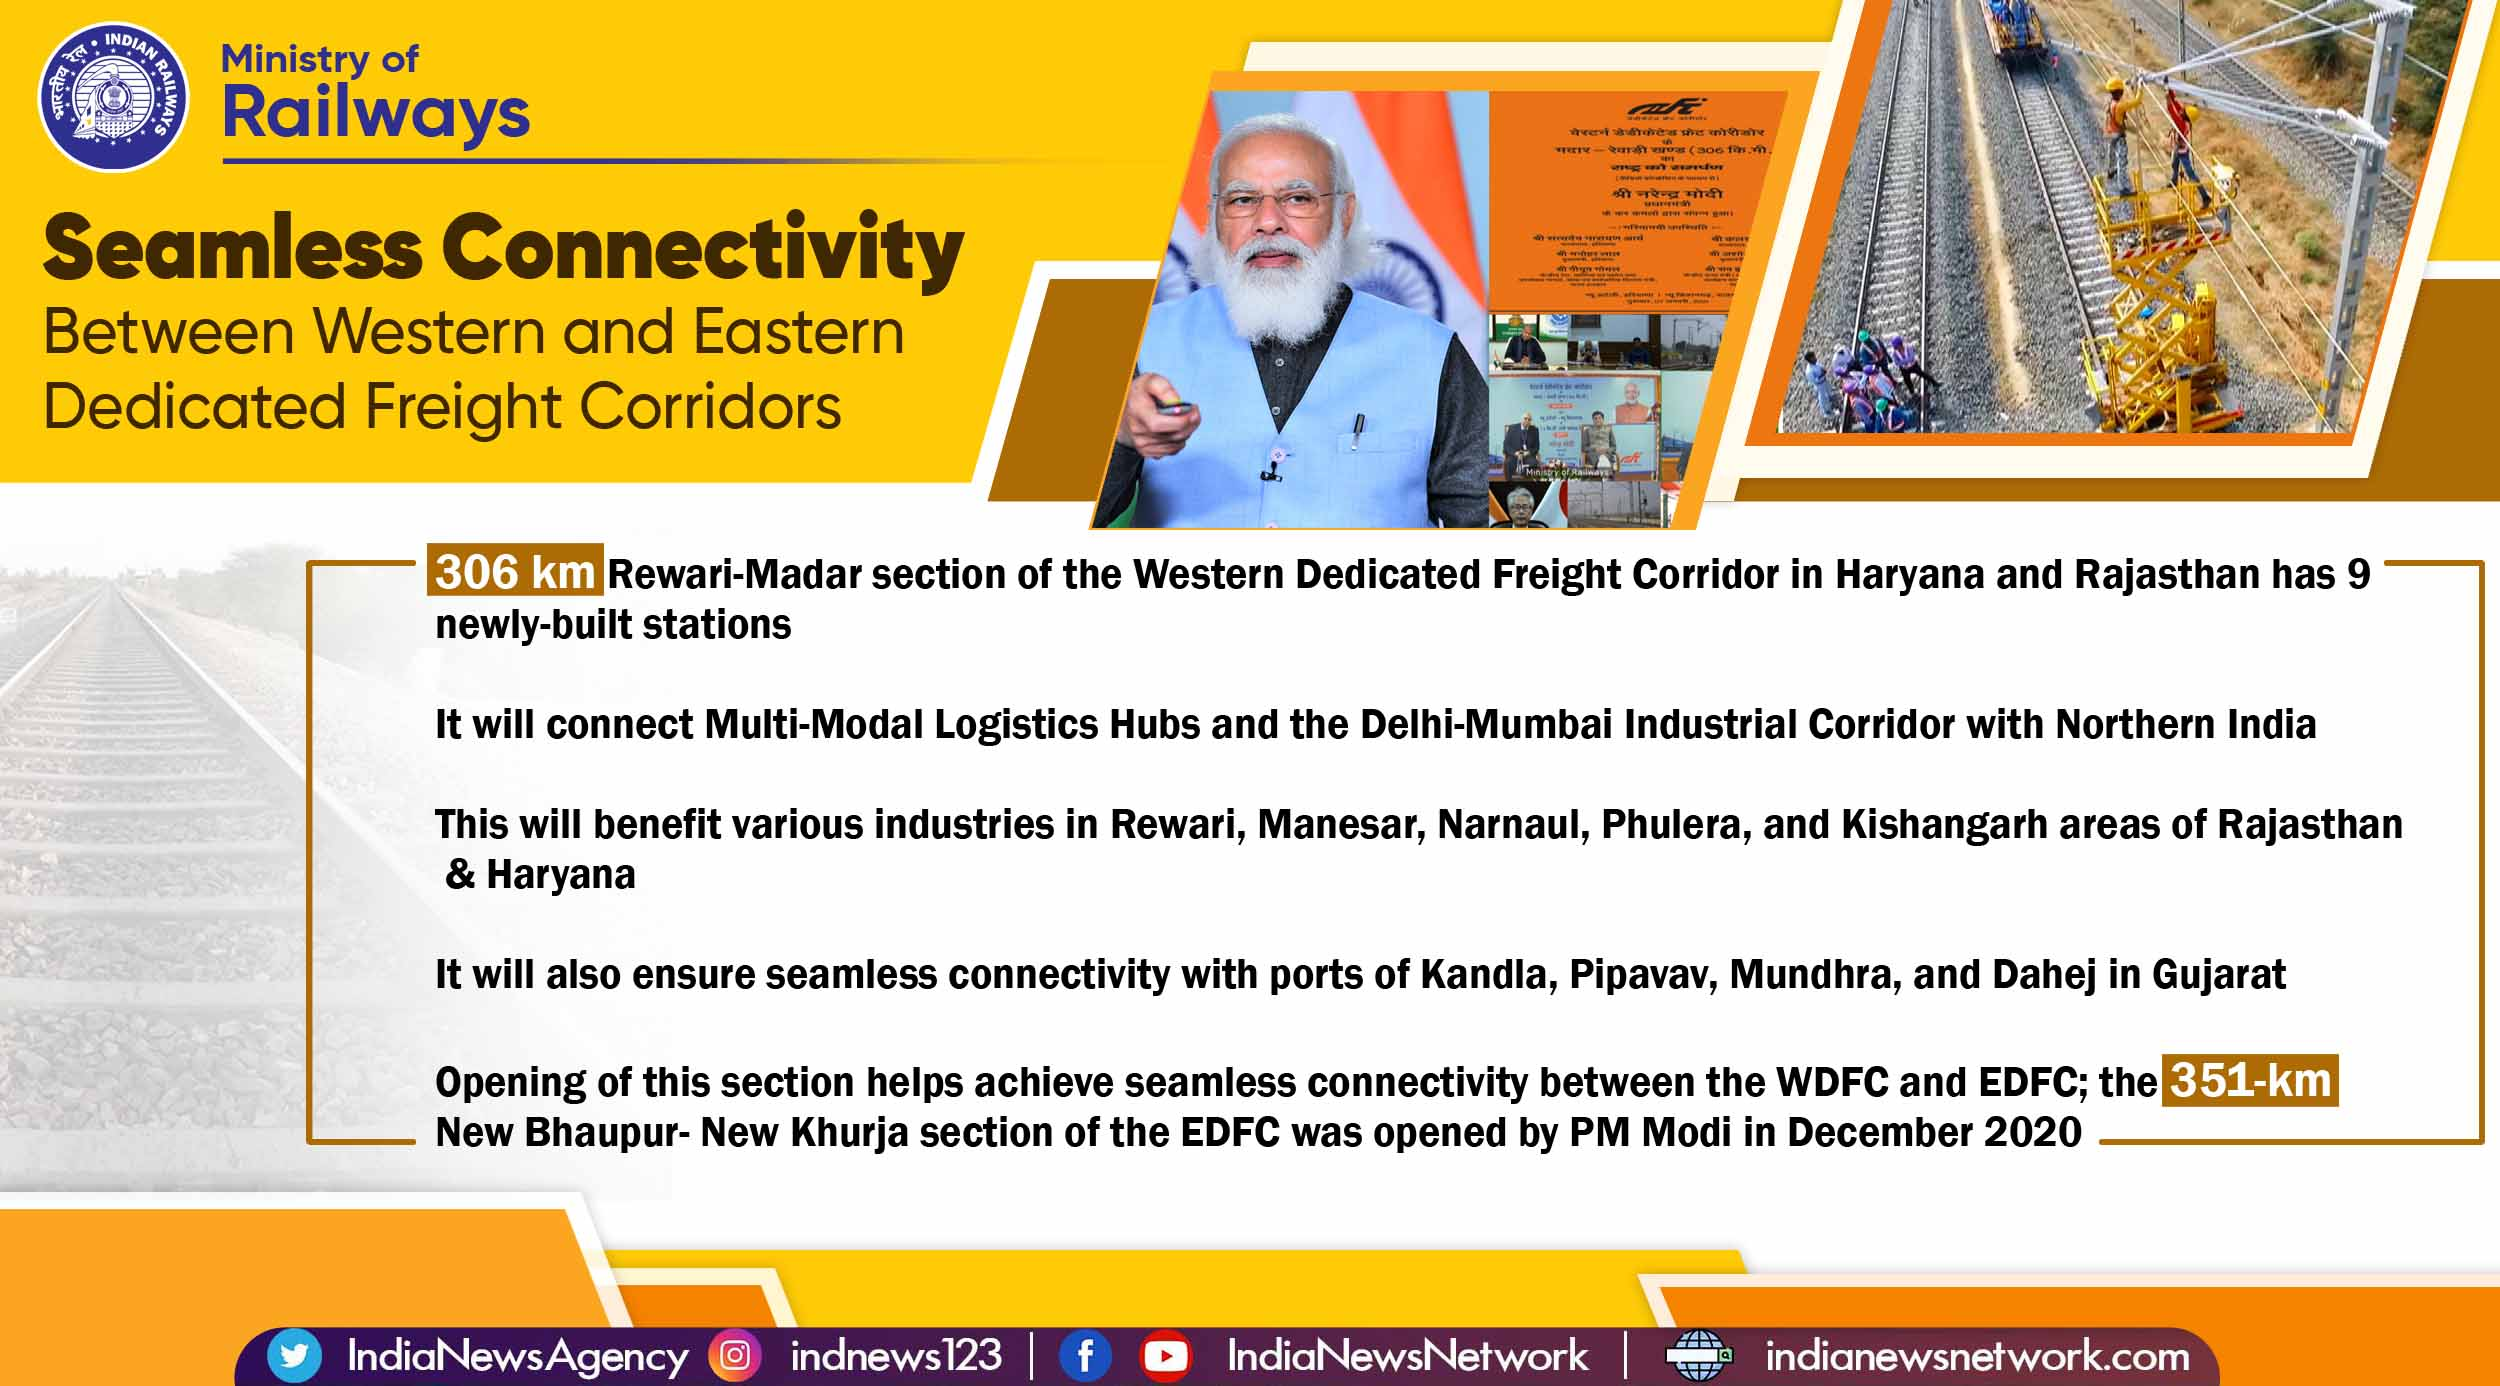 Rewari-Madar section of Western Dedicated Freight Corridor opened by PM Modi